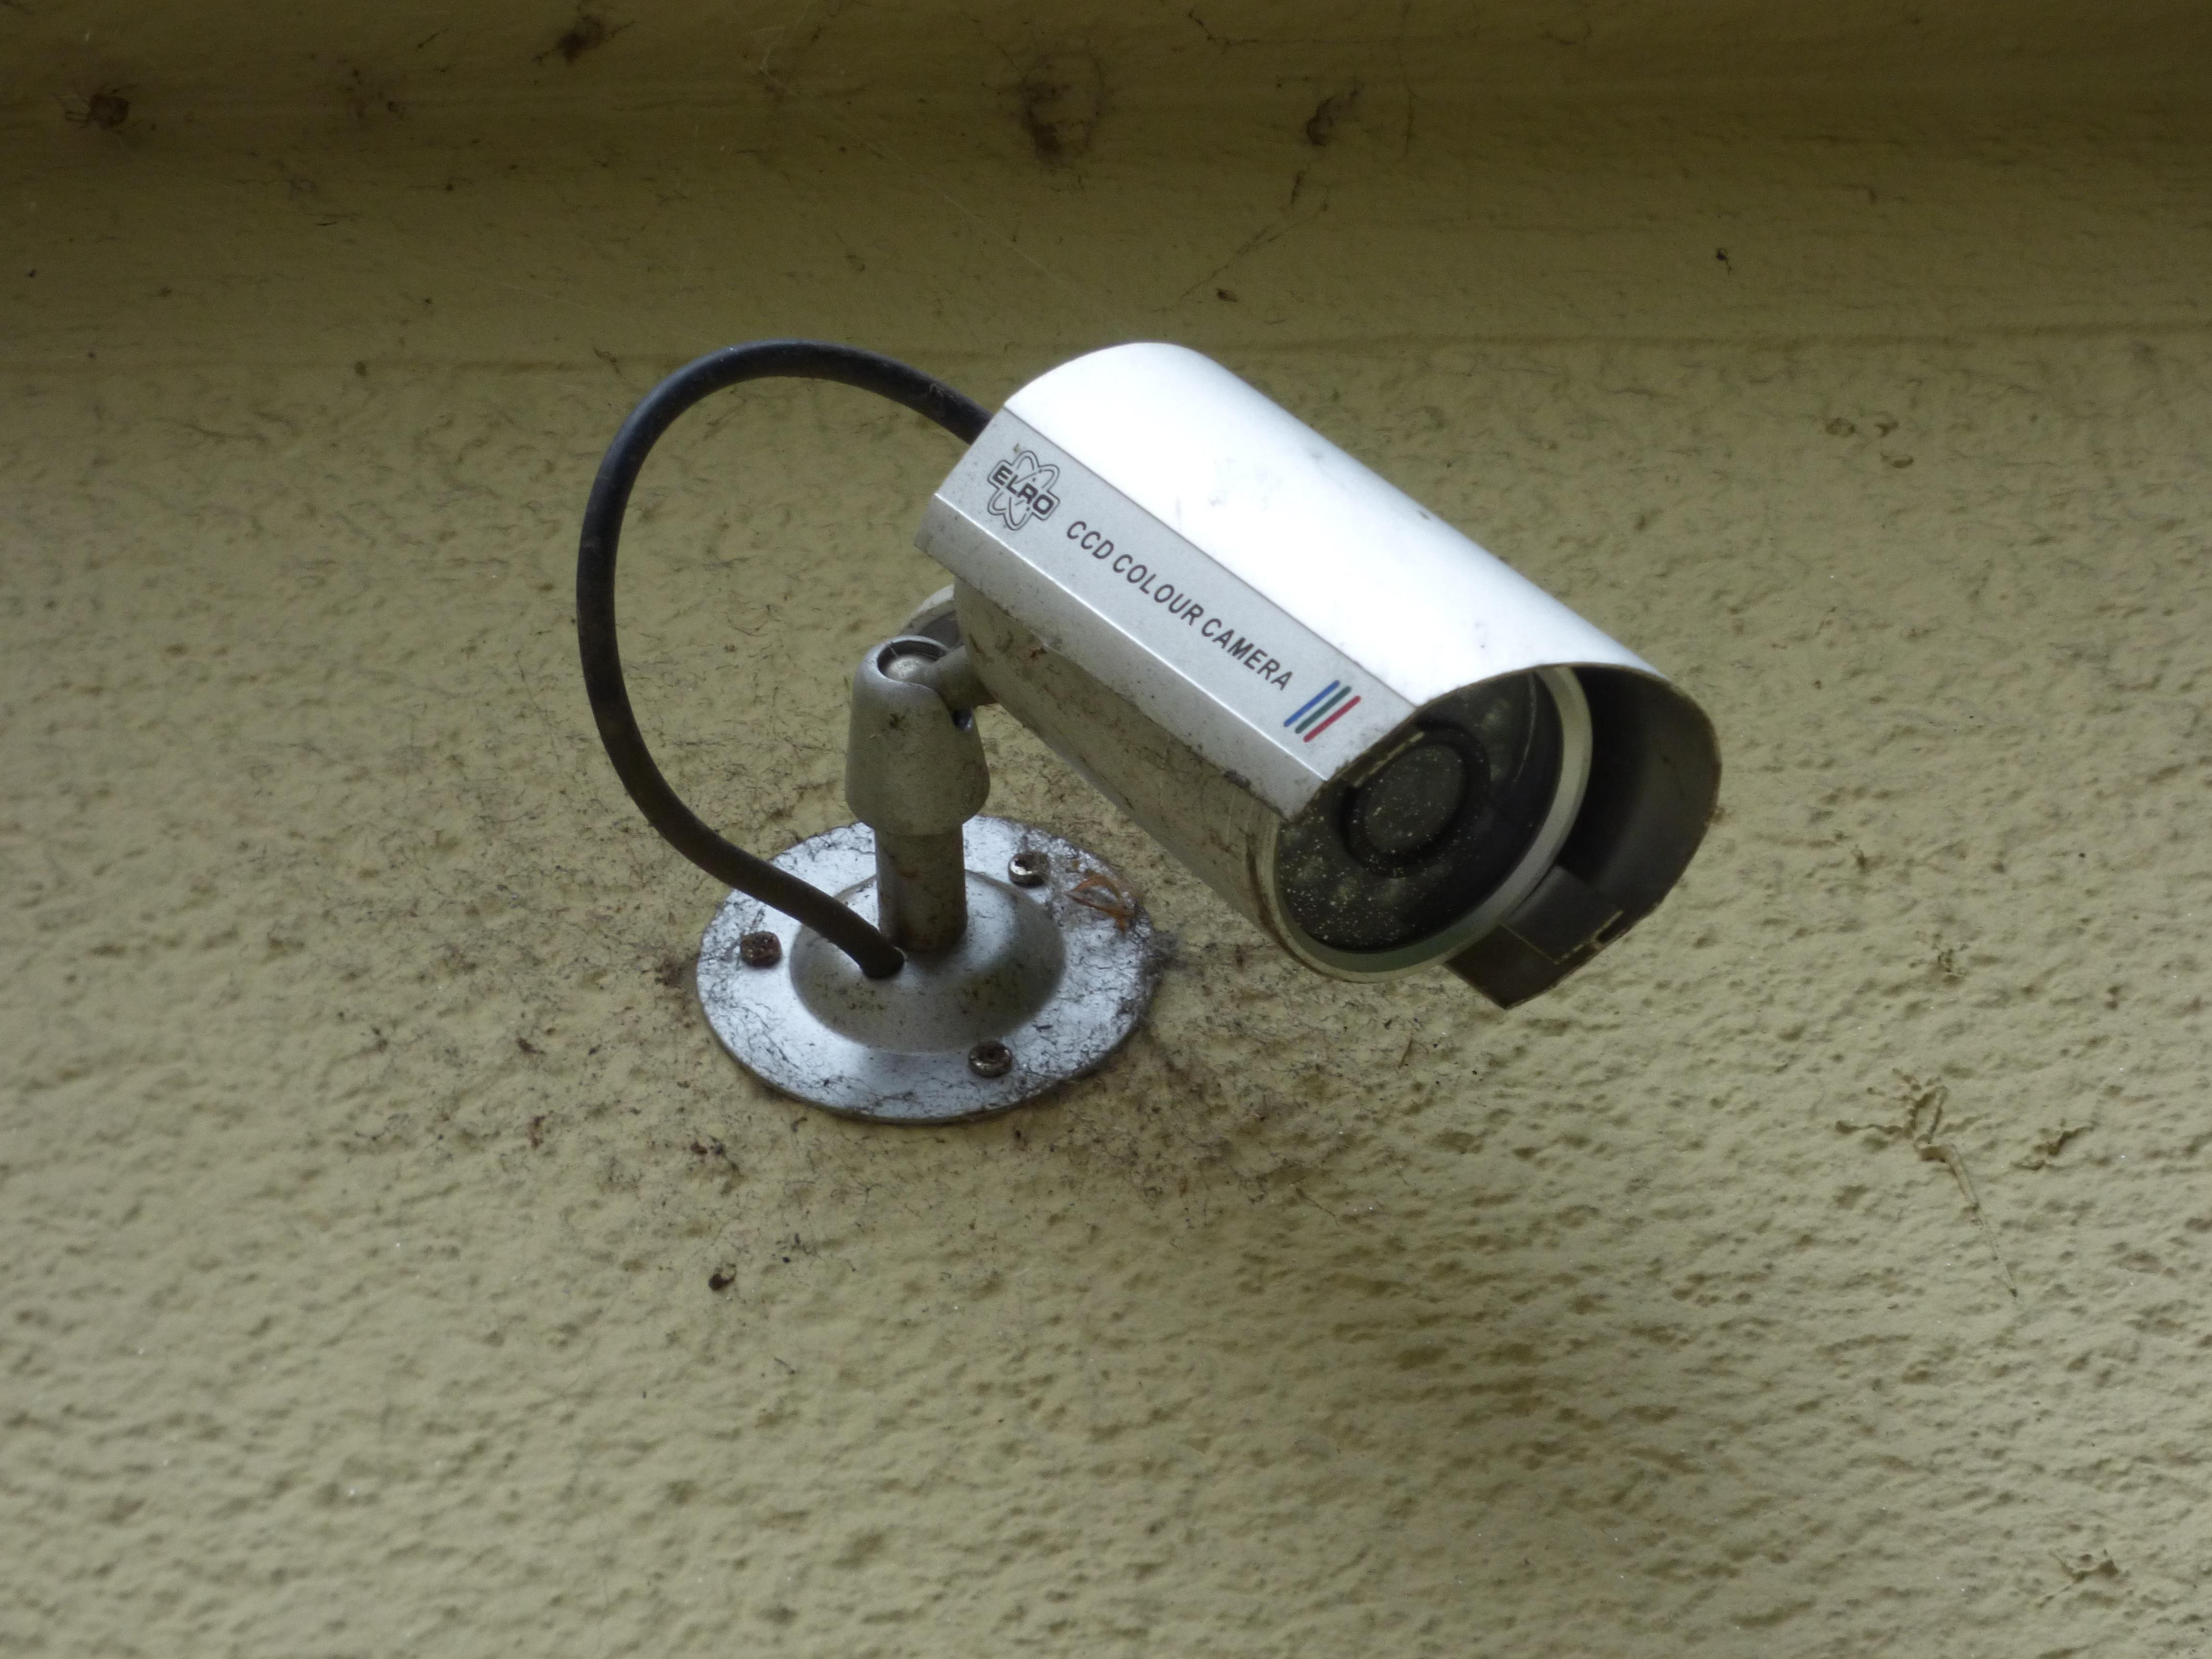 camera wiel machine verlichting video beveiligingscamera observatie toezicht houden preview